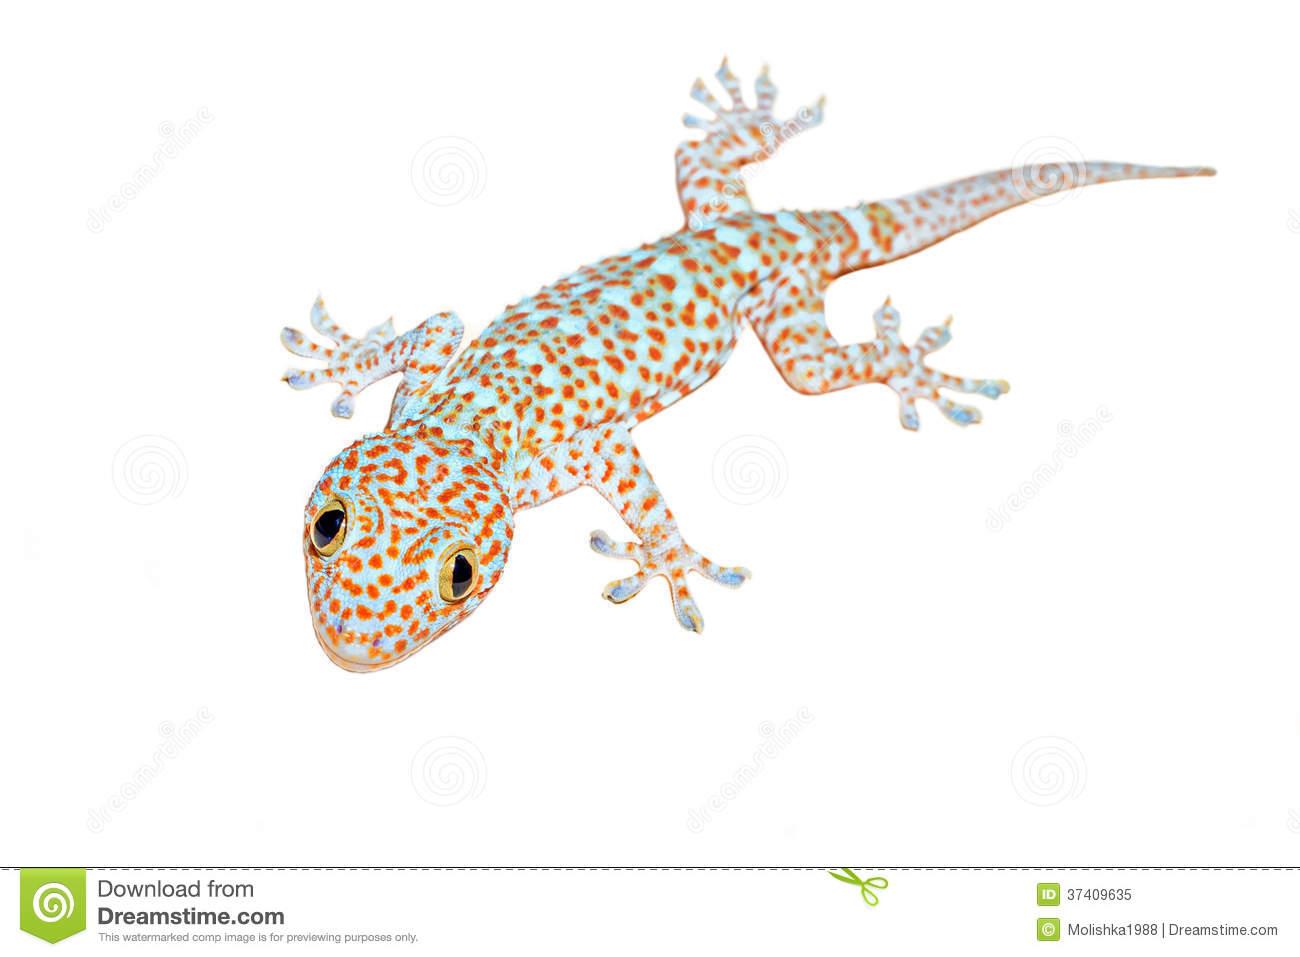 Tokay Gecko clipart #19, Download drawings